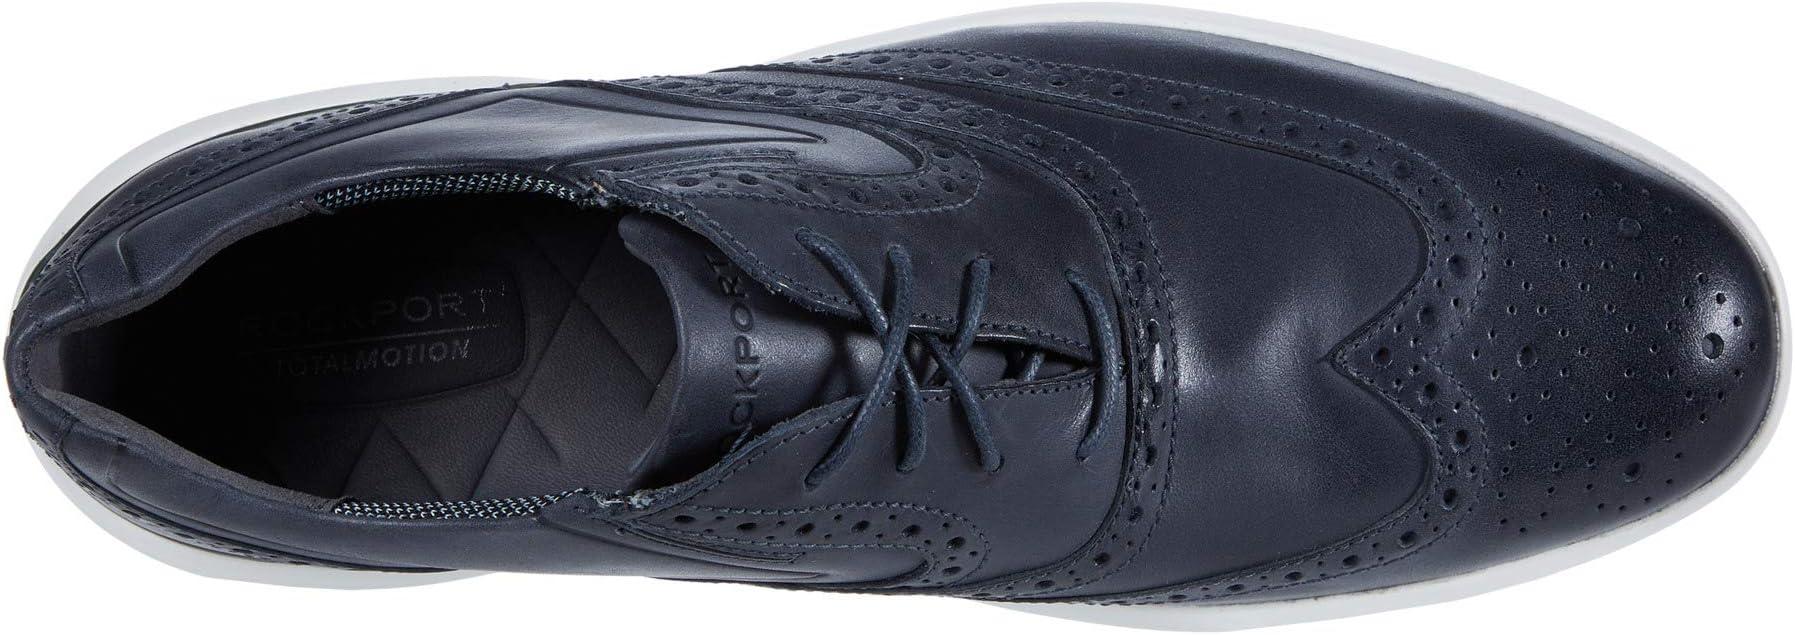 Rockport Total Motion Advance Wing Tip | Men's shoes | 2020 Newest